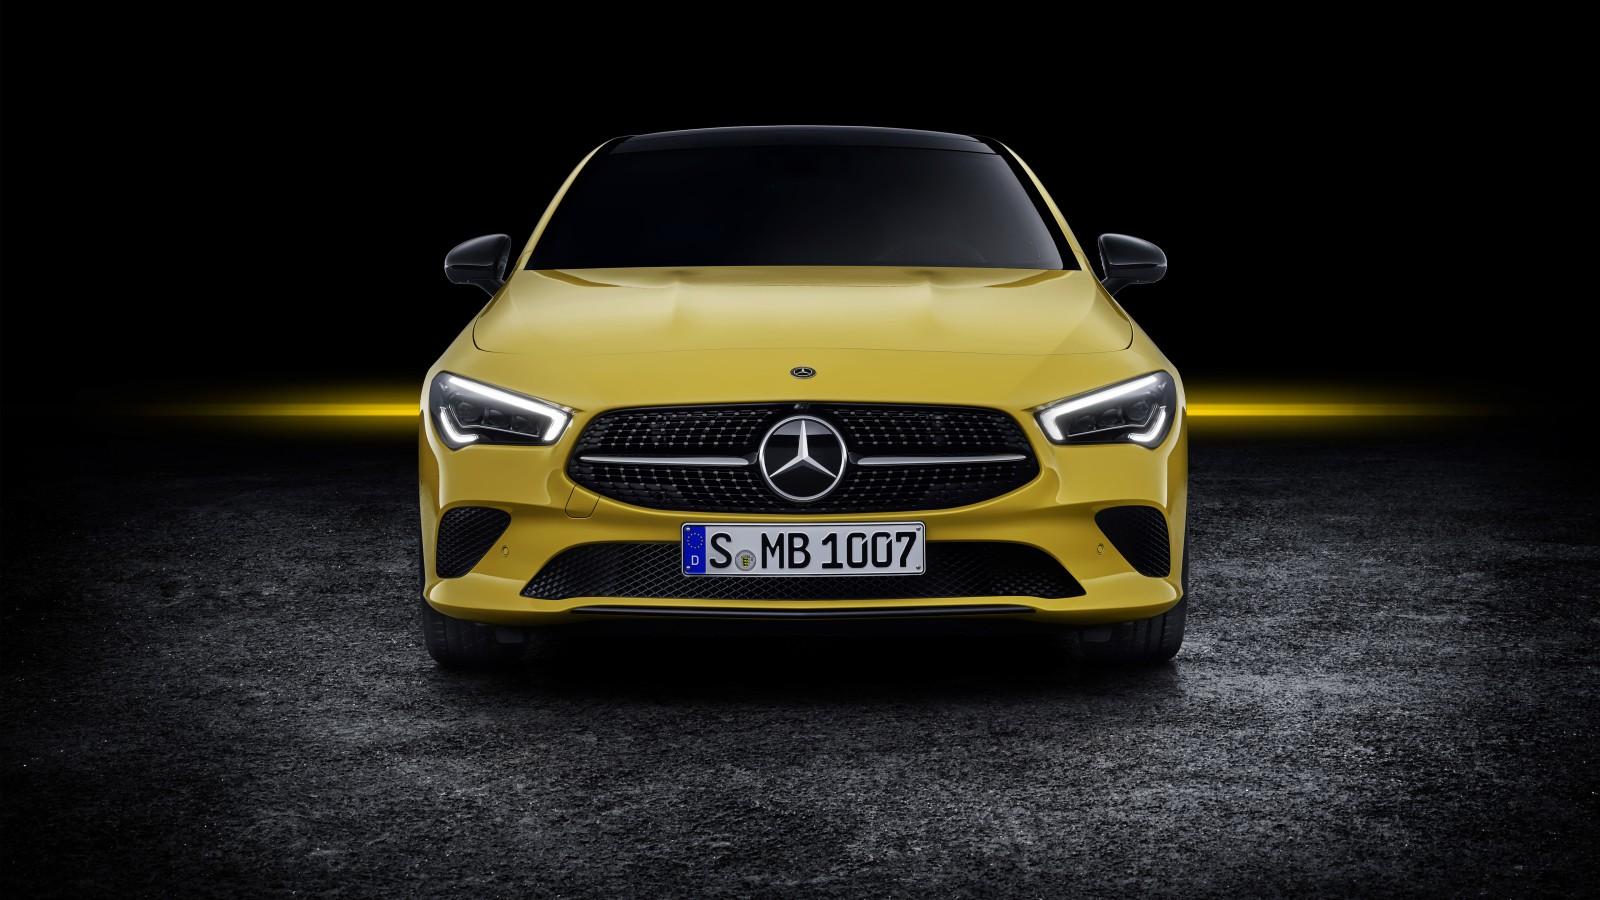 Mercedes Benz Cla >> Mercedes-Benz CLA-Klasse Shooting Brake 2019 5K Wallpaper | HD Car Wallpapers | ID #12222